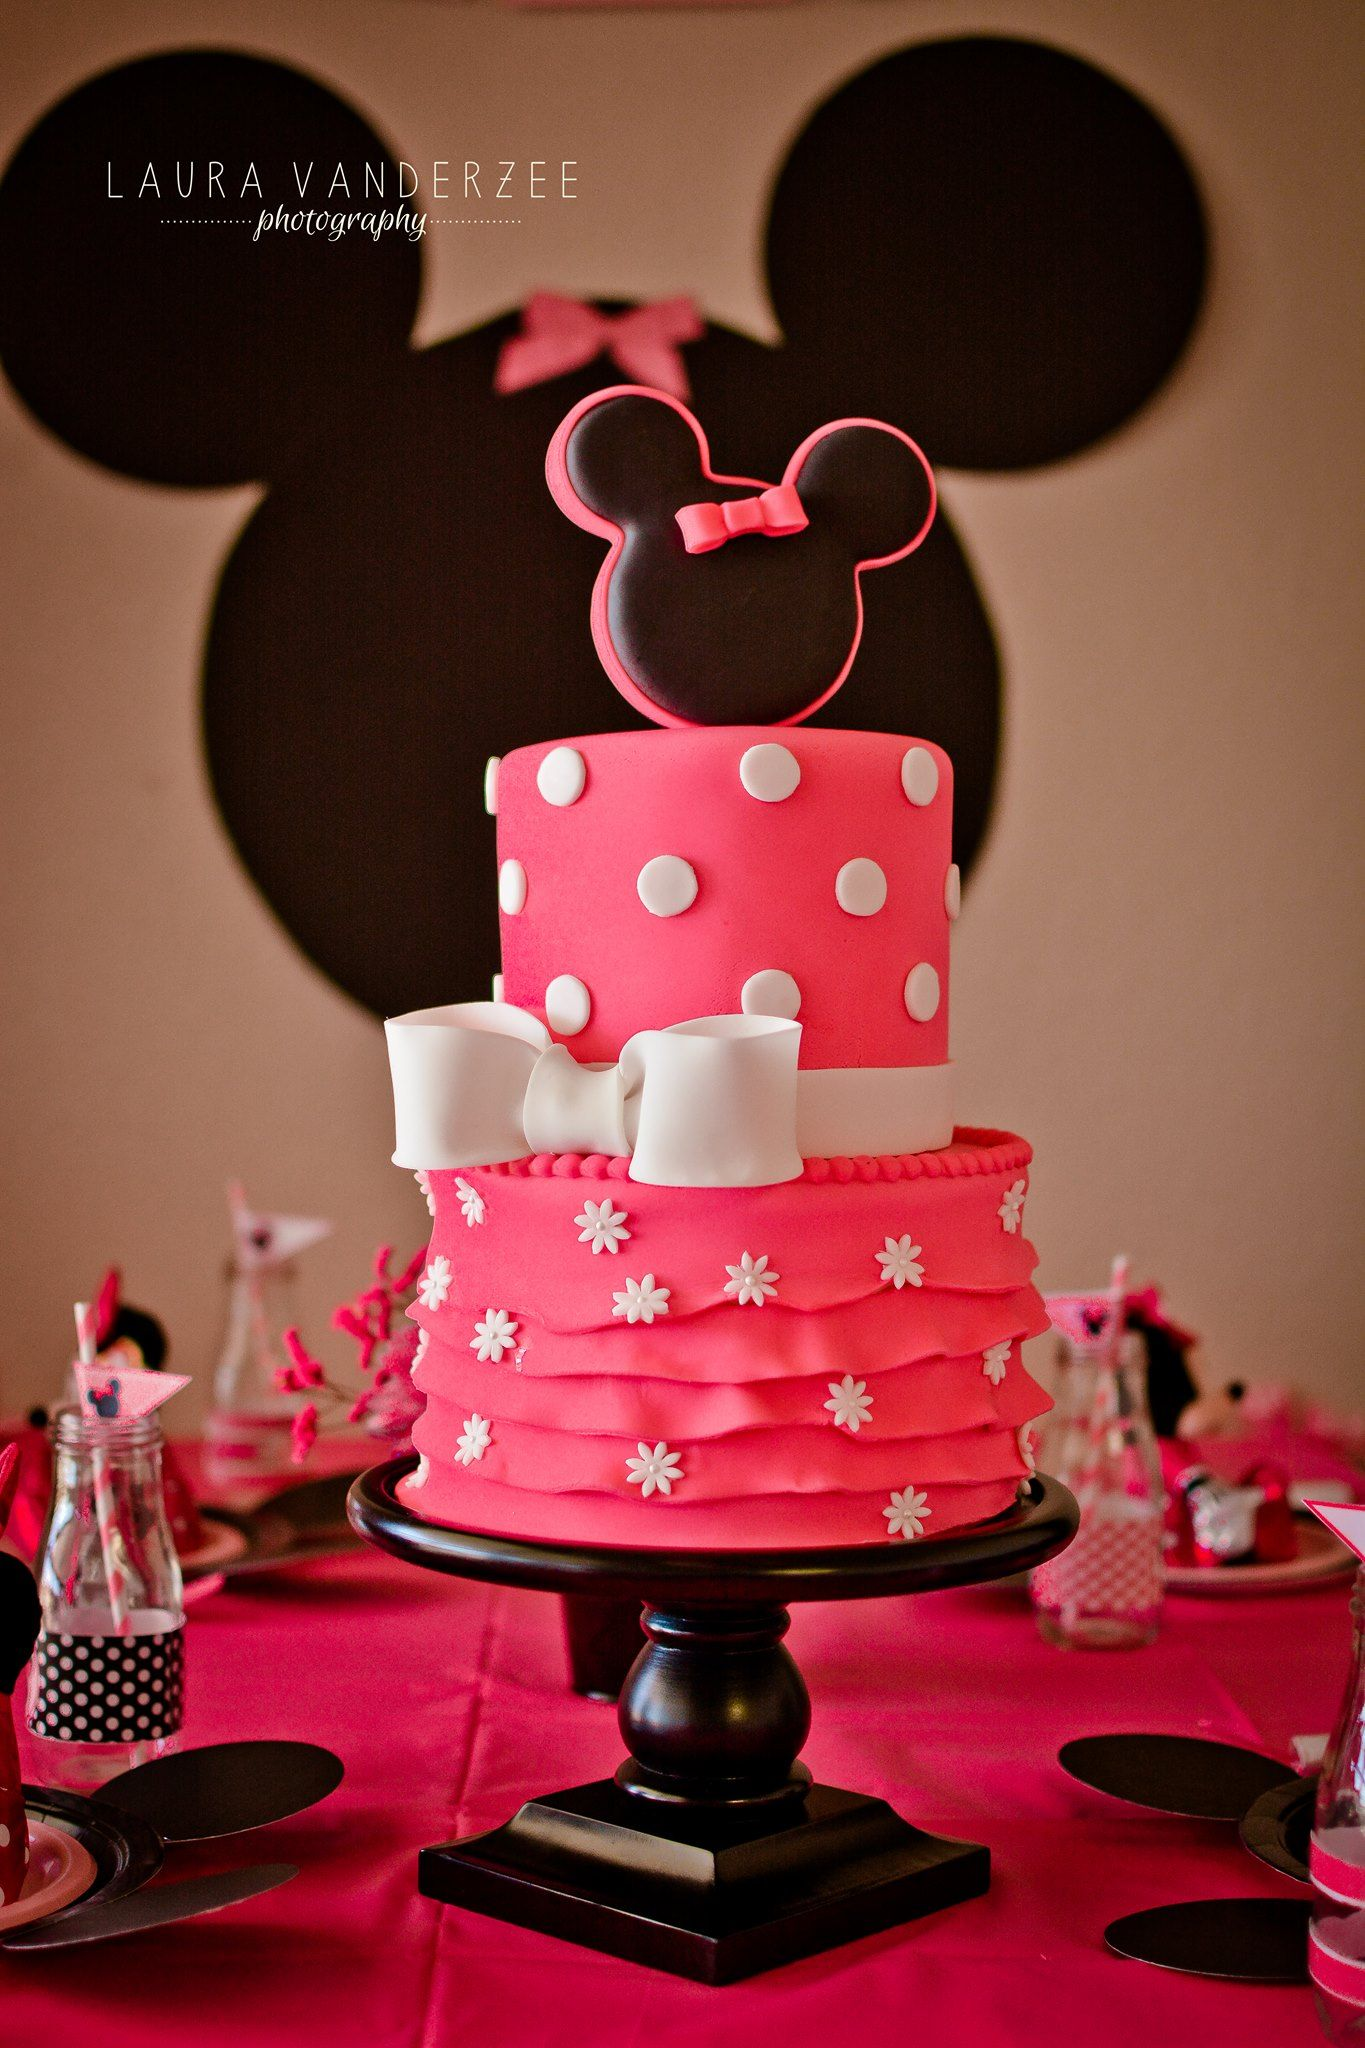 Minnie mouse cake photo taken by laura vanderzee